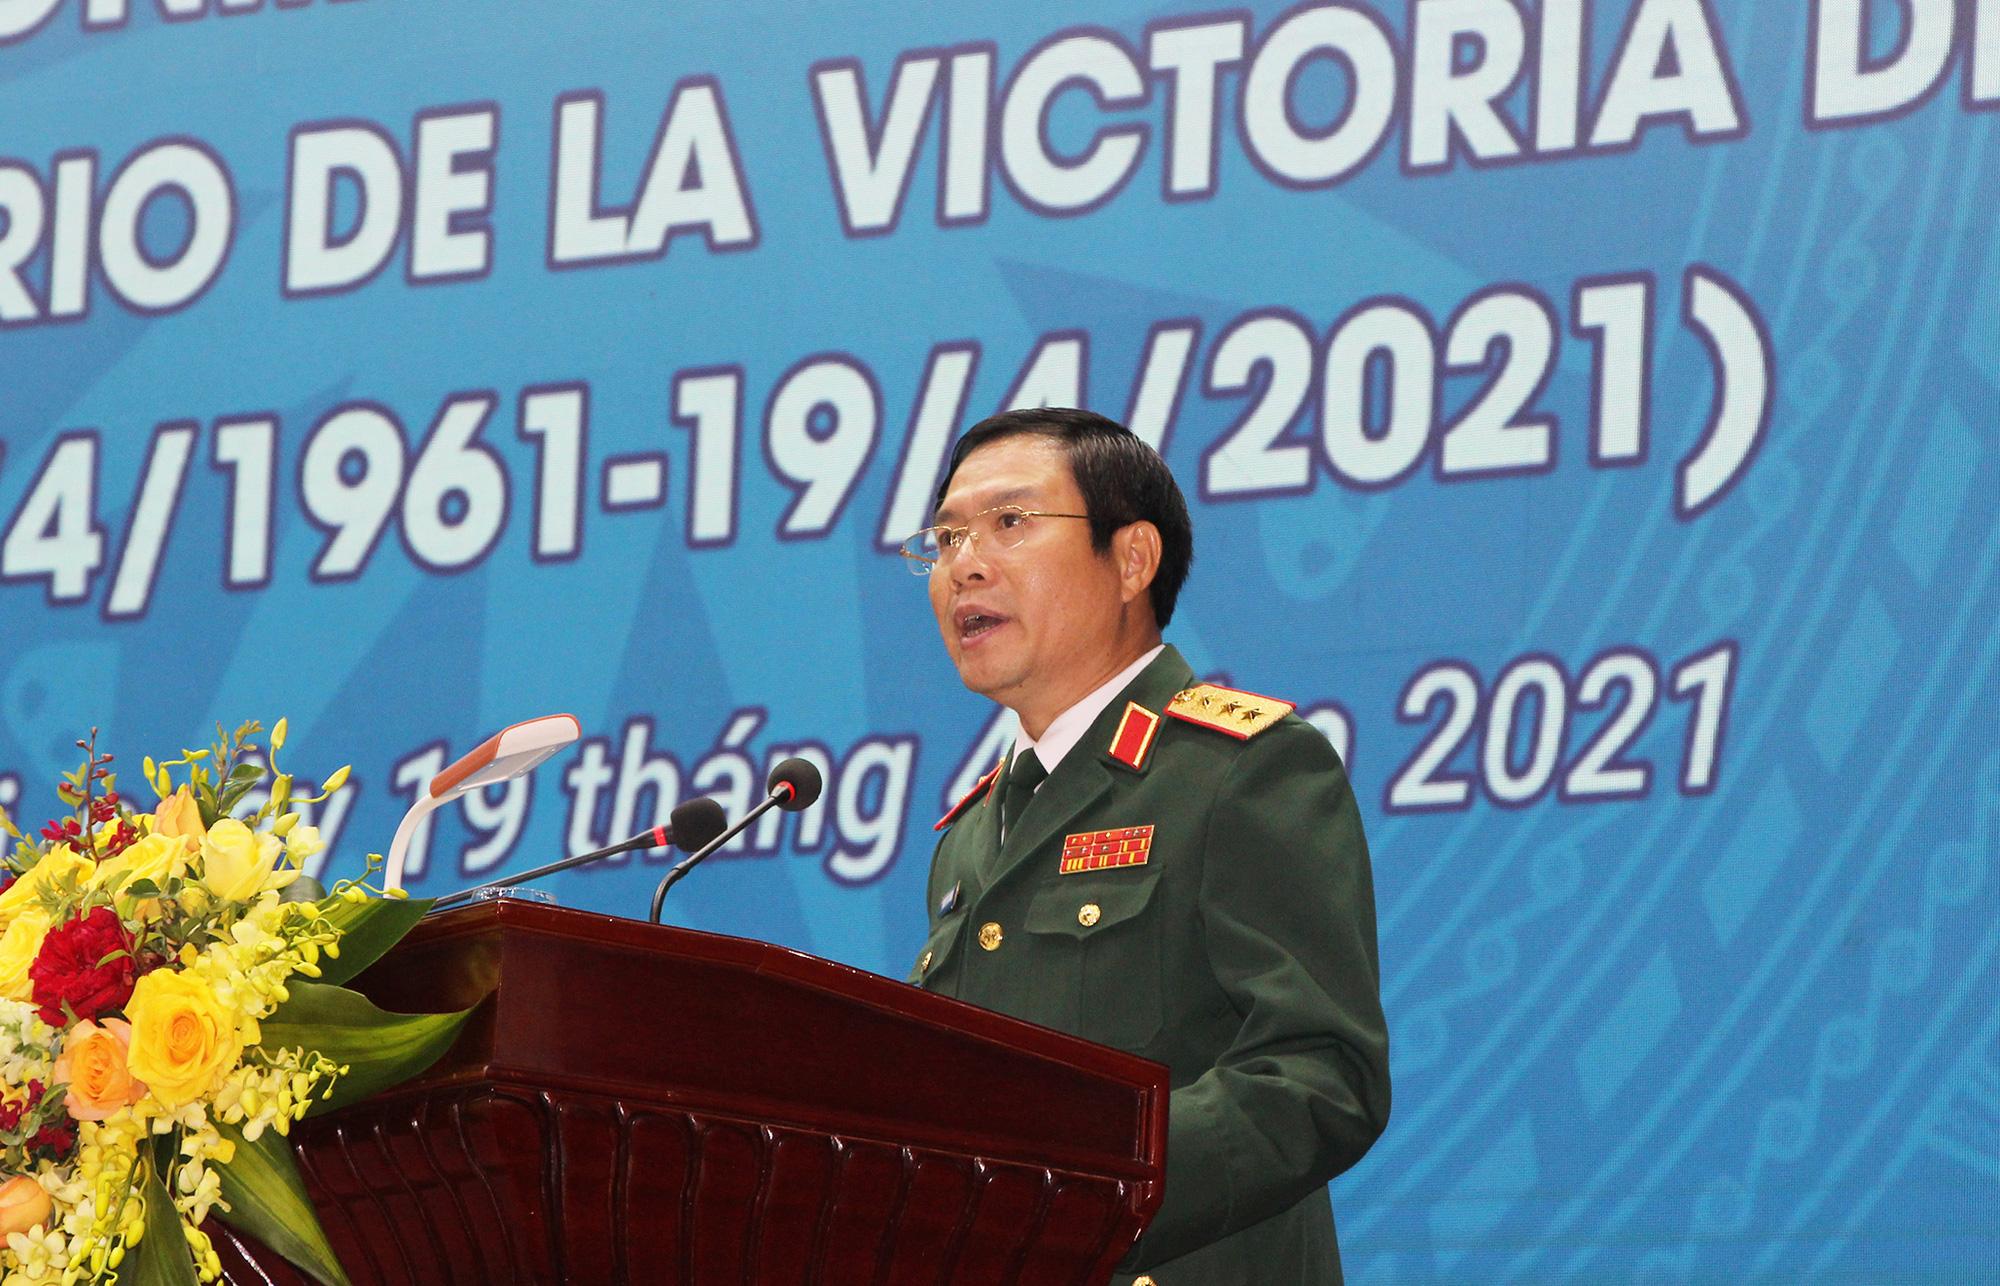 Cuba's Girón victory celebrated in Hanoi